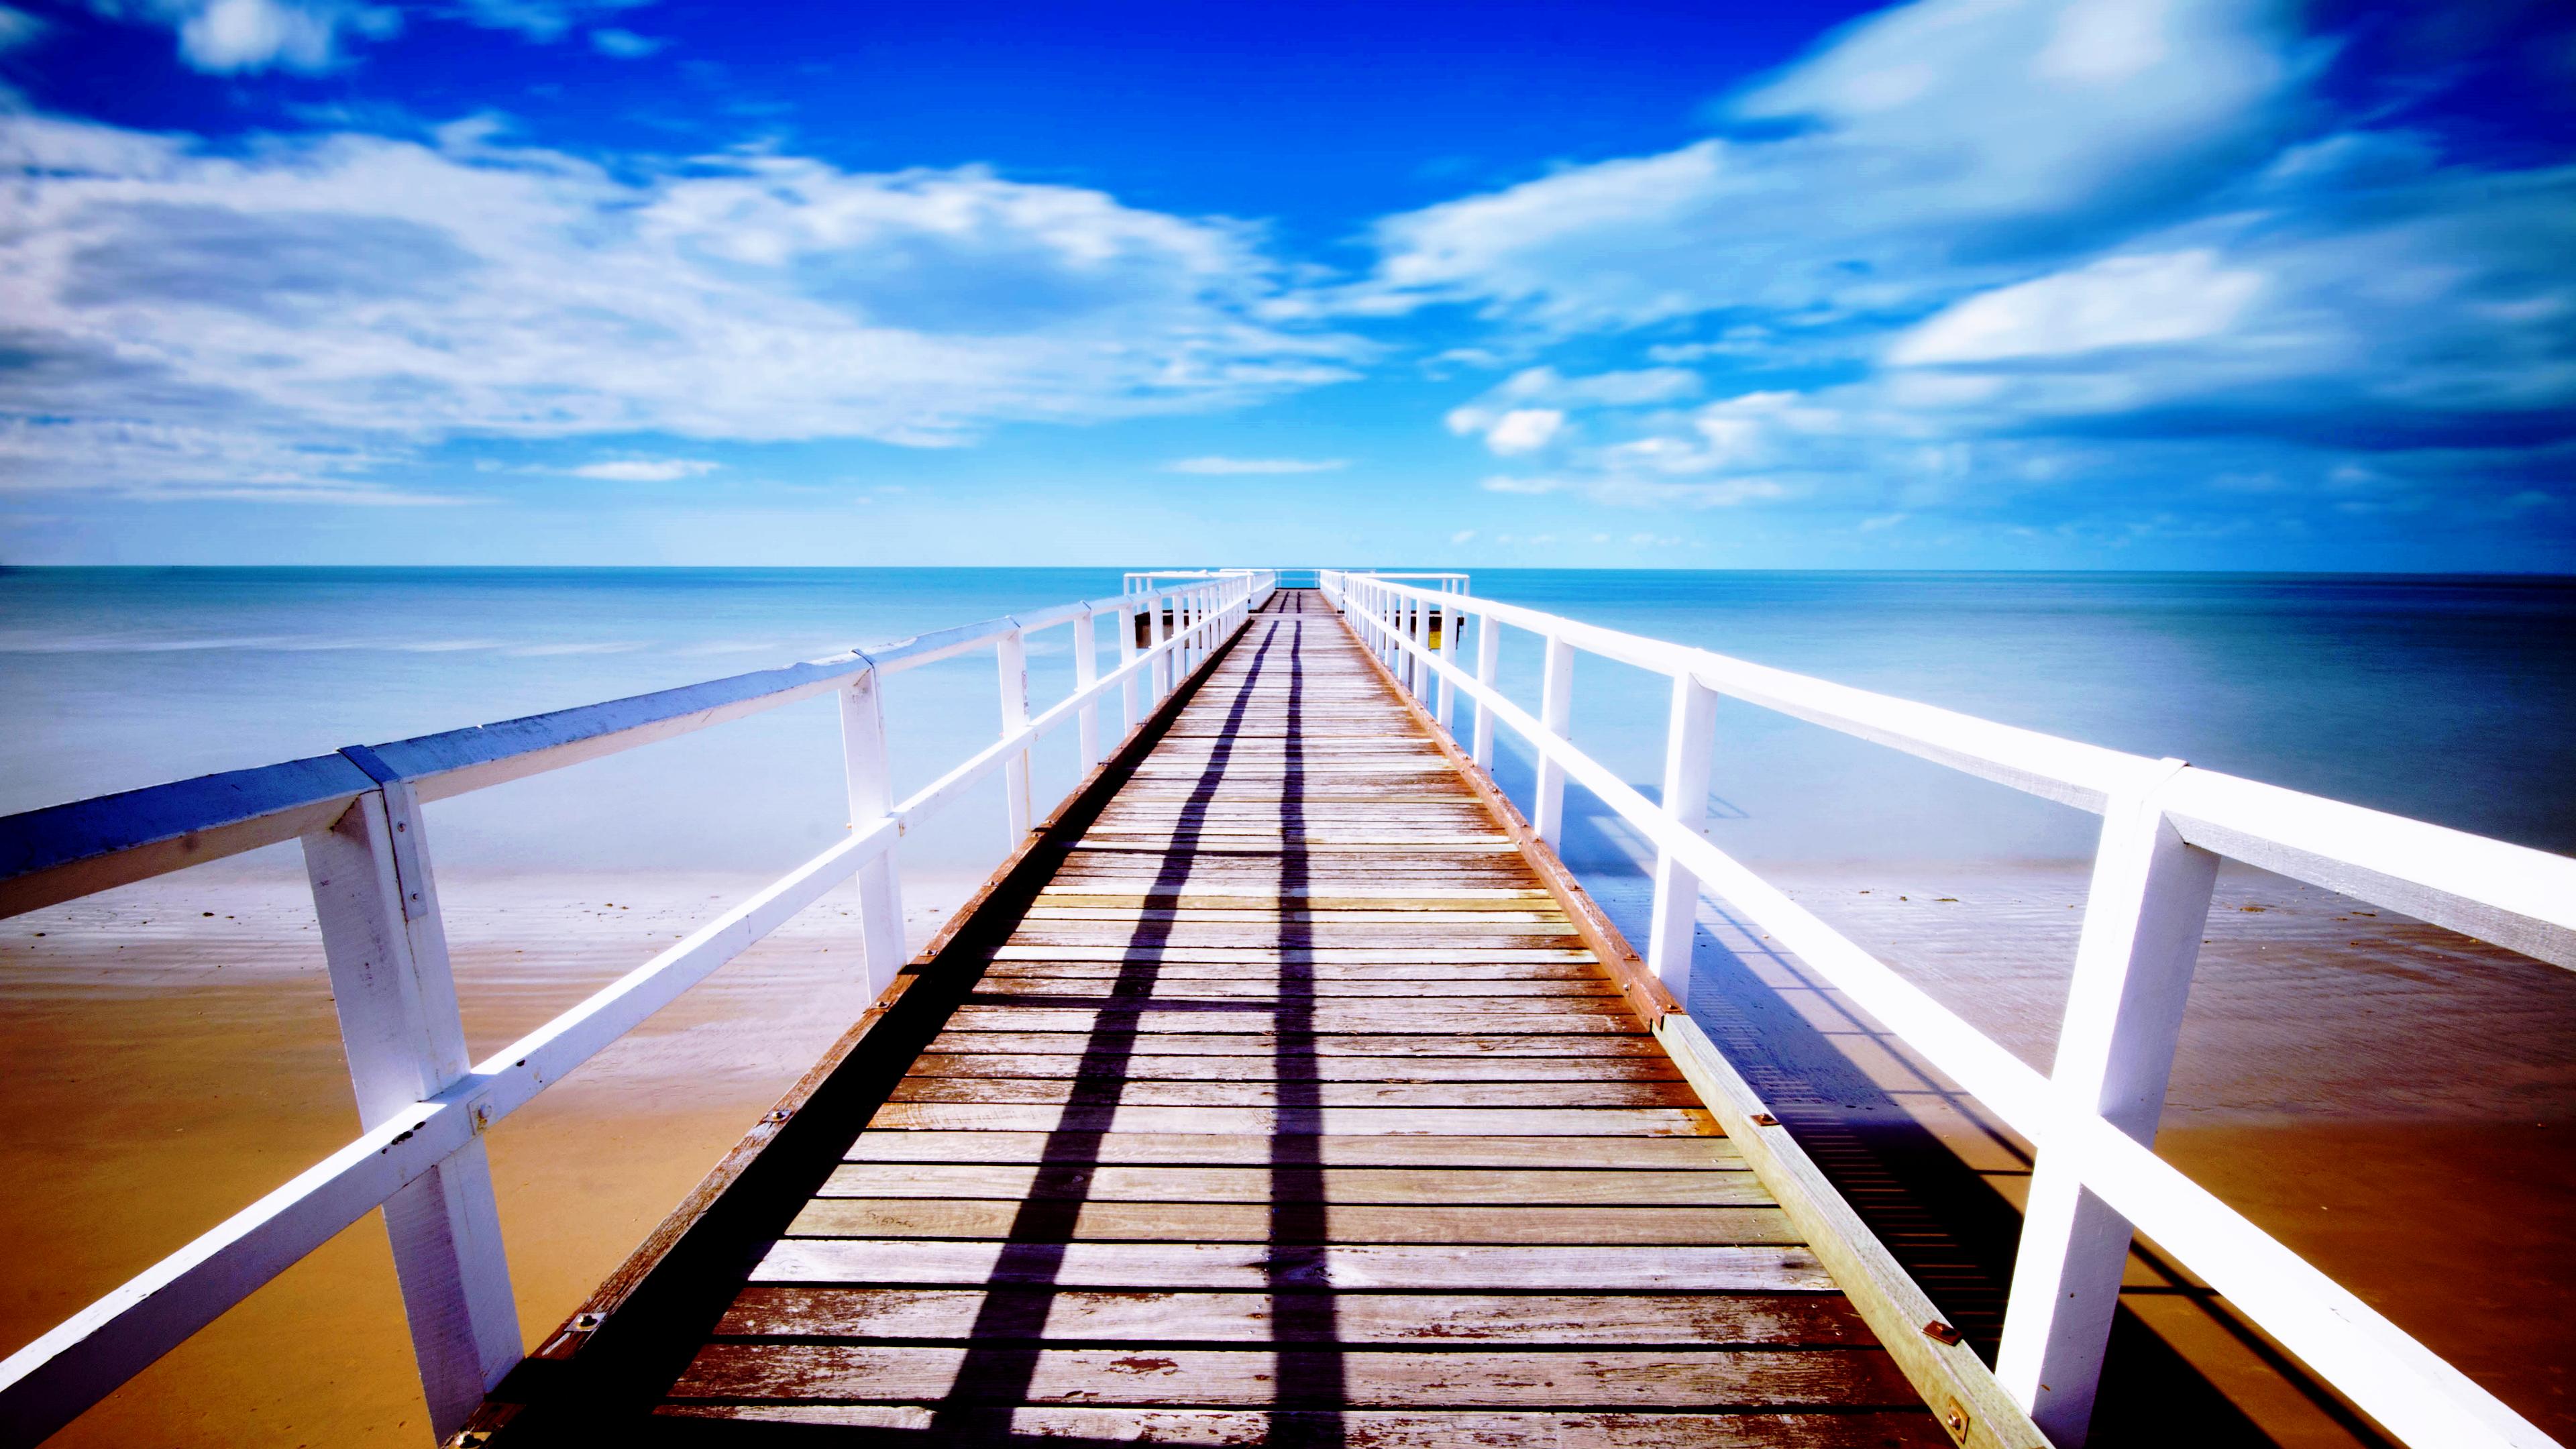 General 3840x2160 bridge pier sky clouds sea water sand blue yellow orange wood white horizon